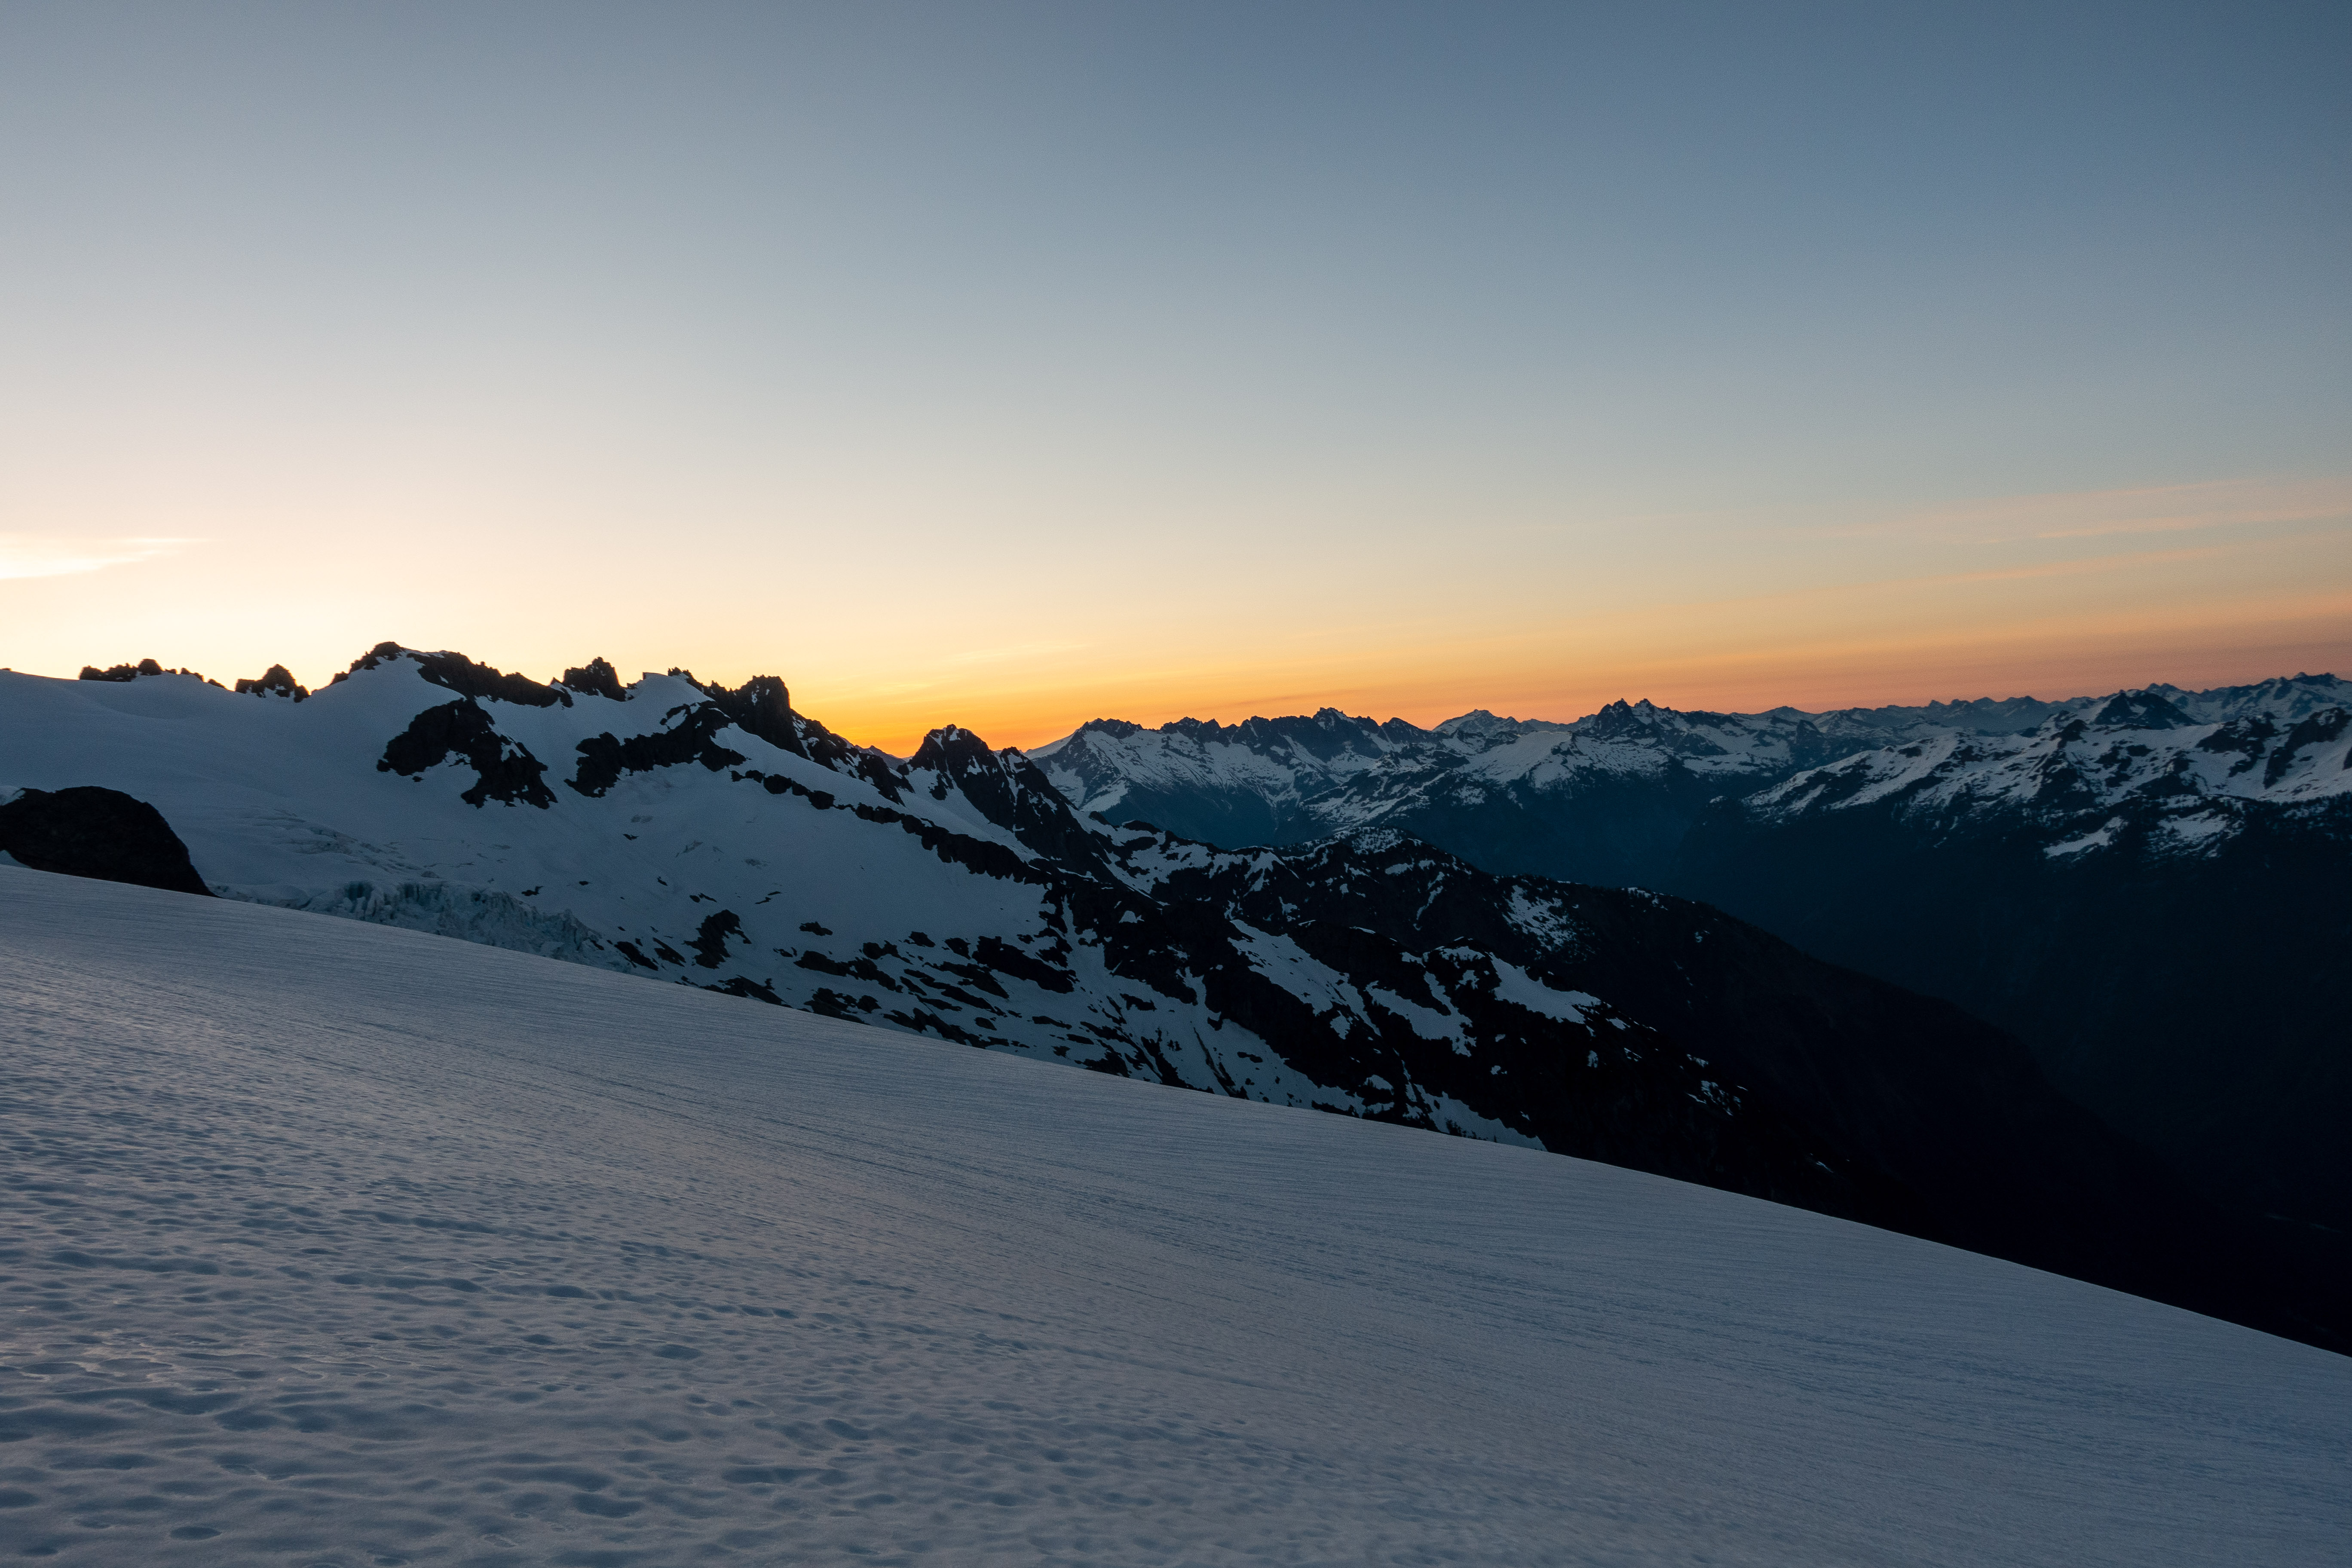 Sunrise in the alpine.